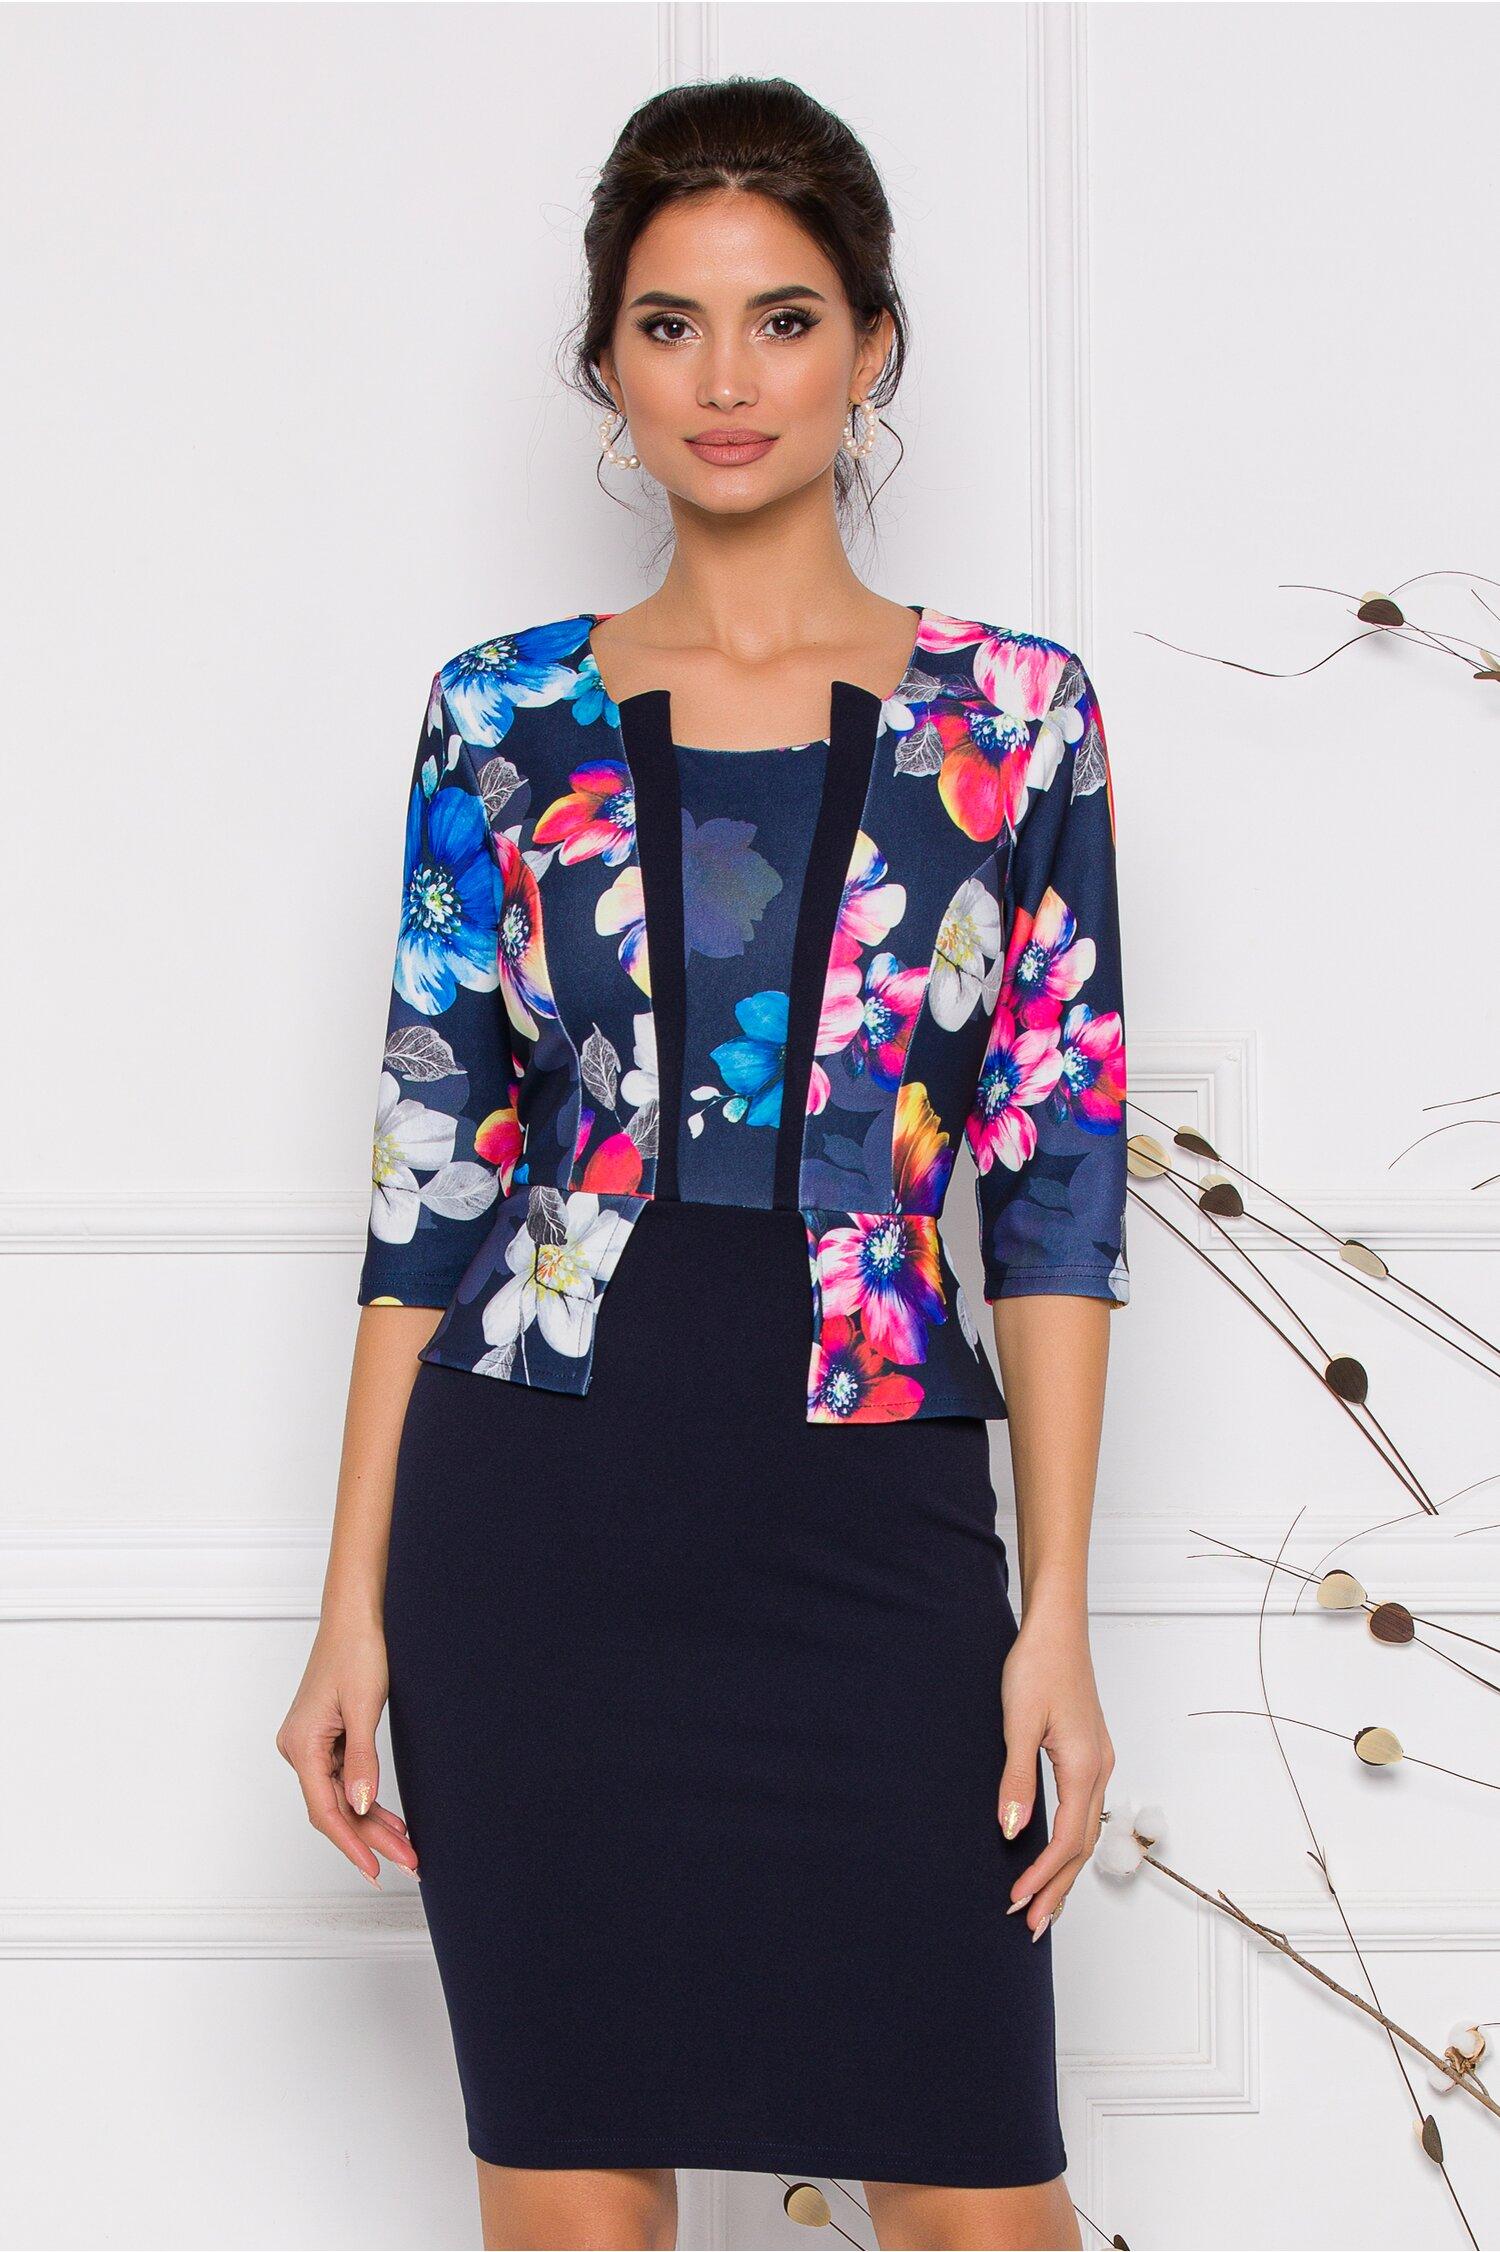 Rochie Anisia bleumarin imprimeu floral multicolor imagine